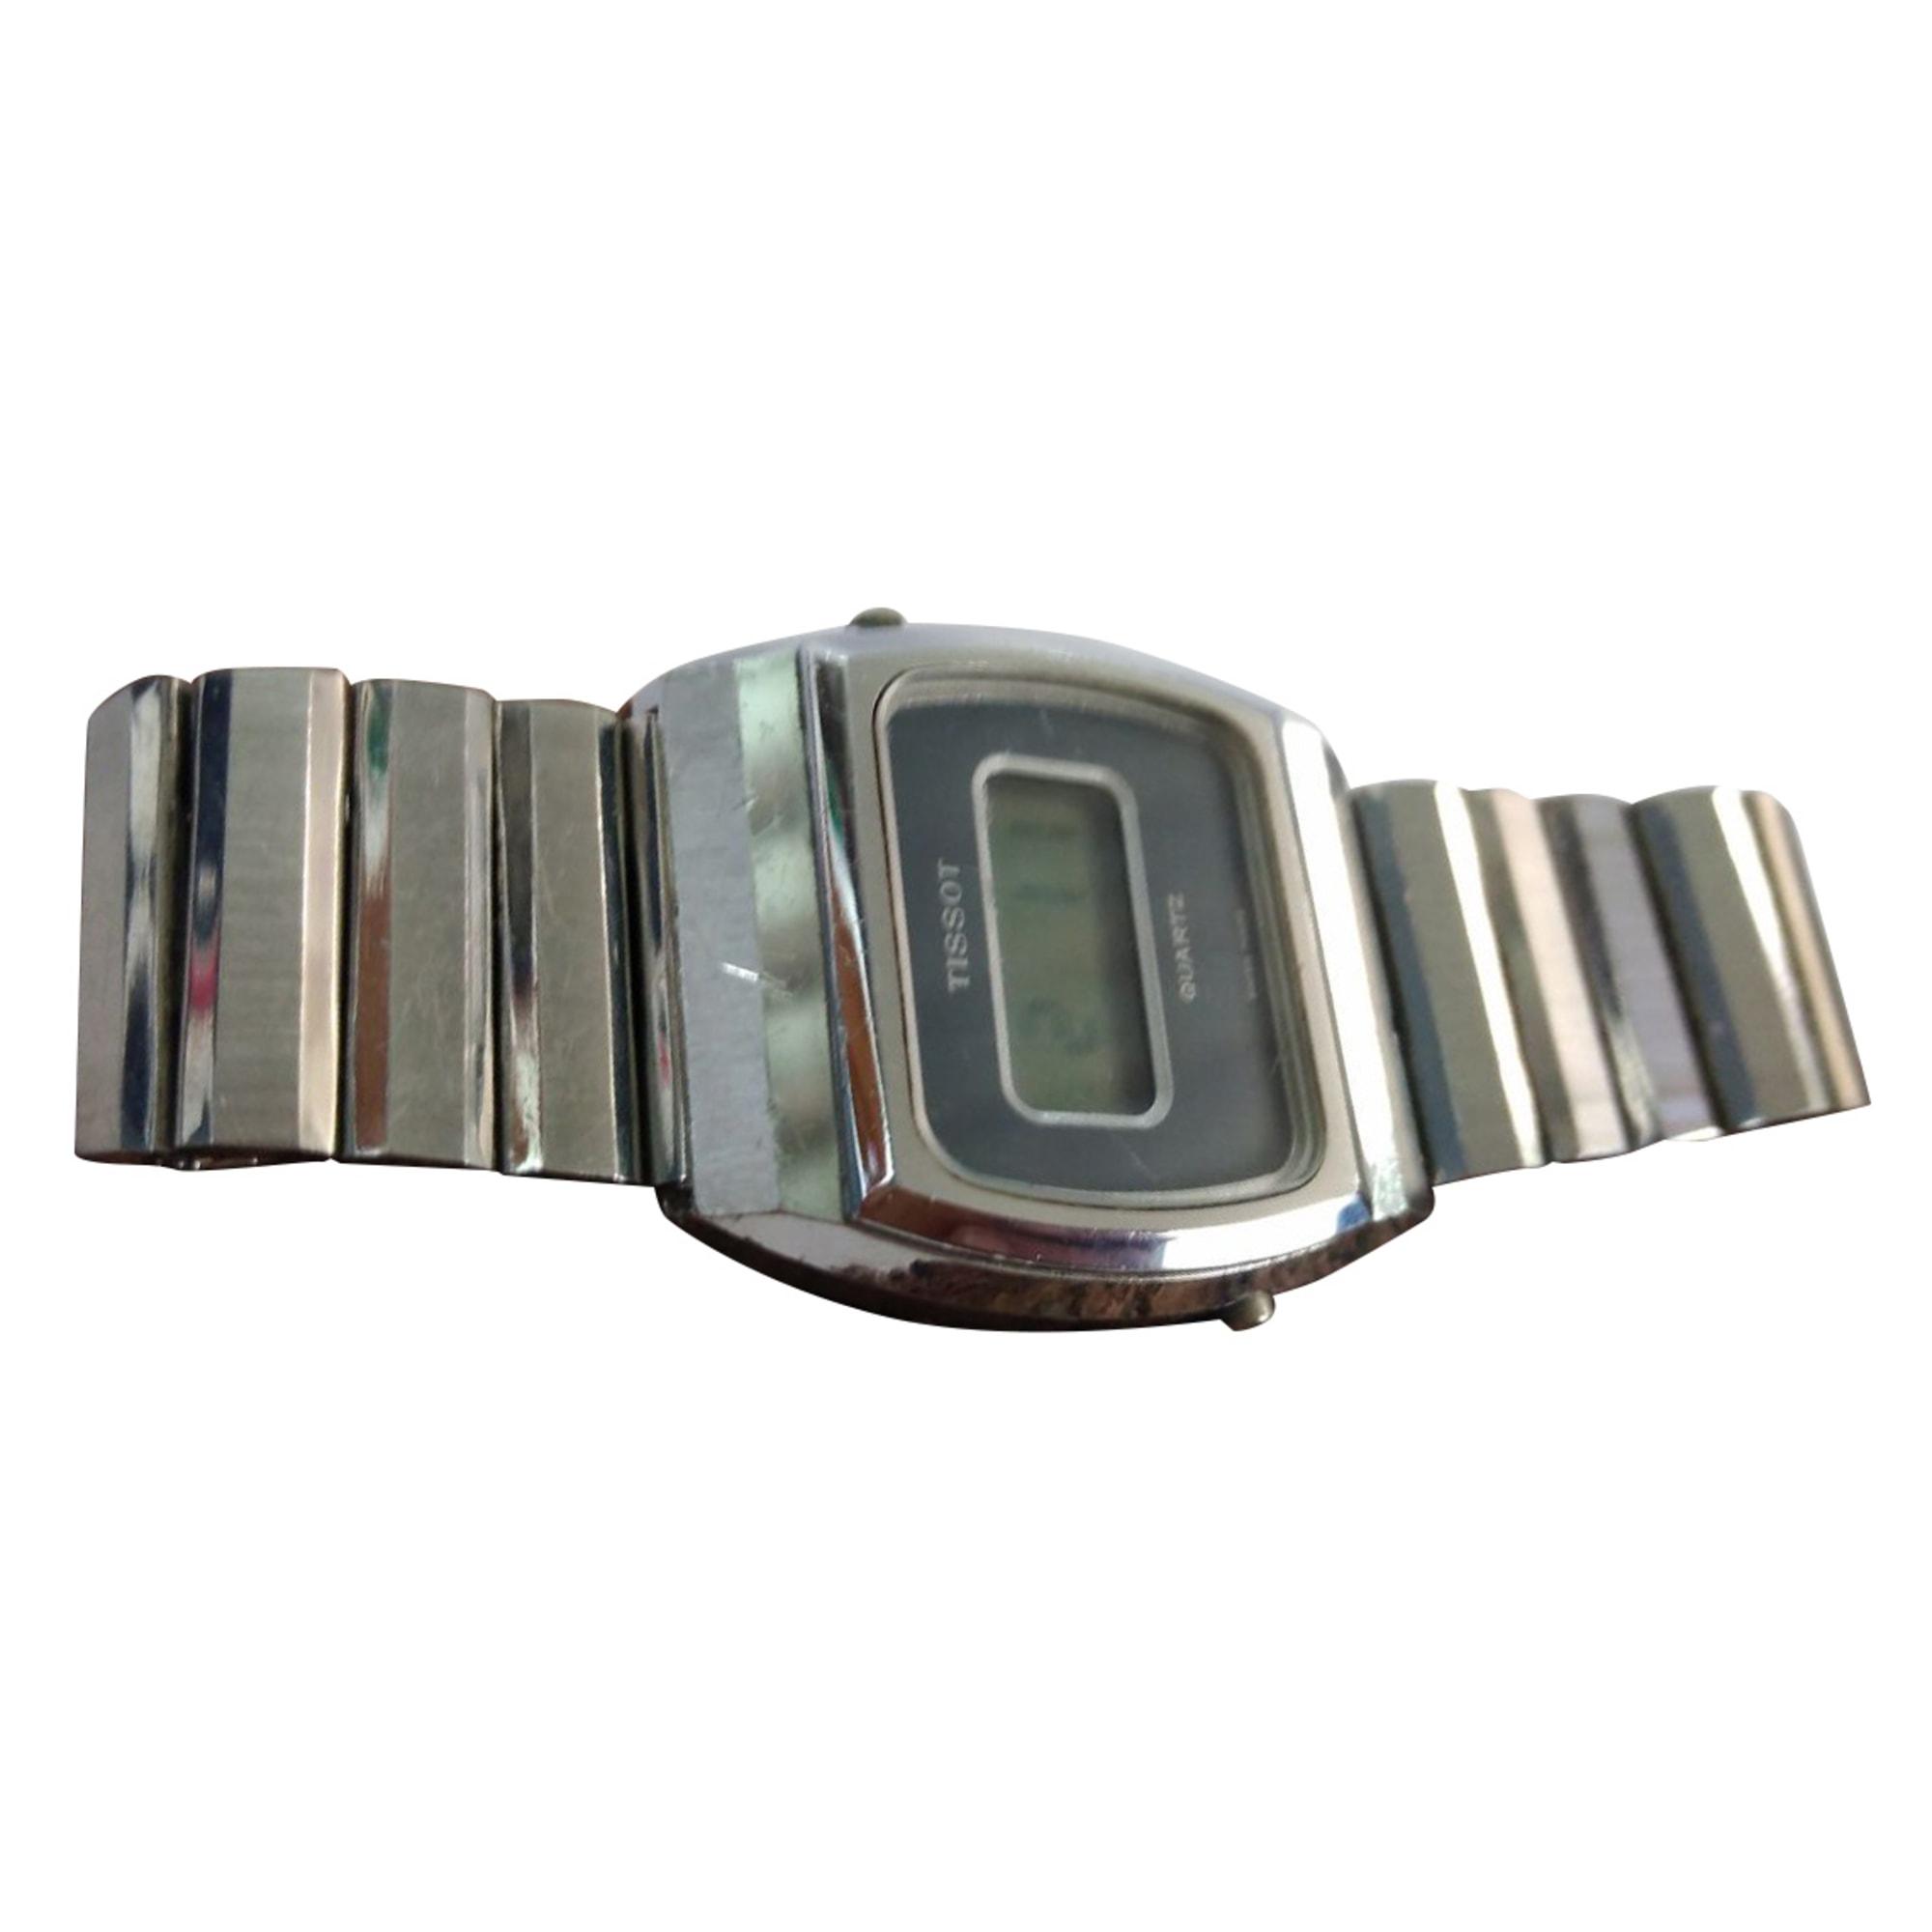 Armbanduhr TISSOT Silberfarben, stahlfarben